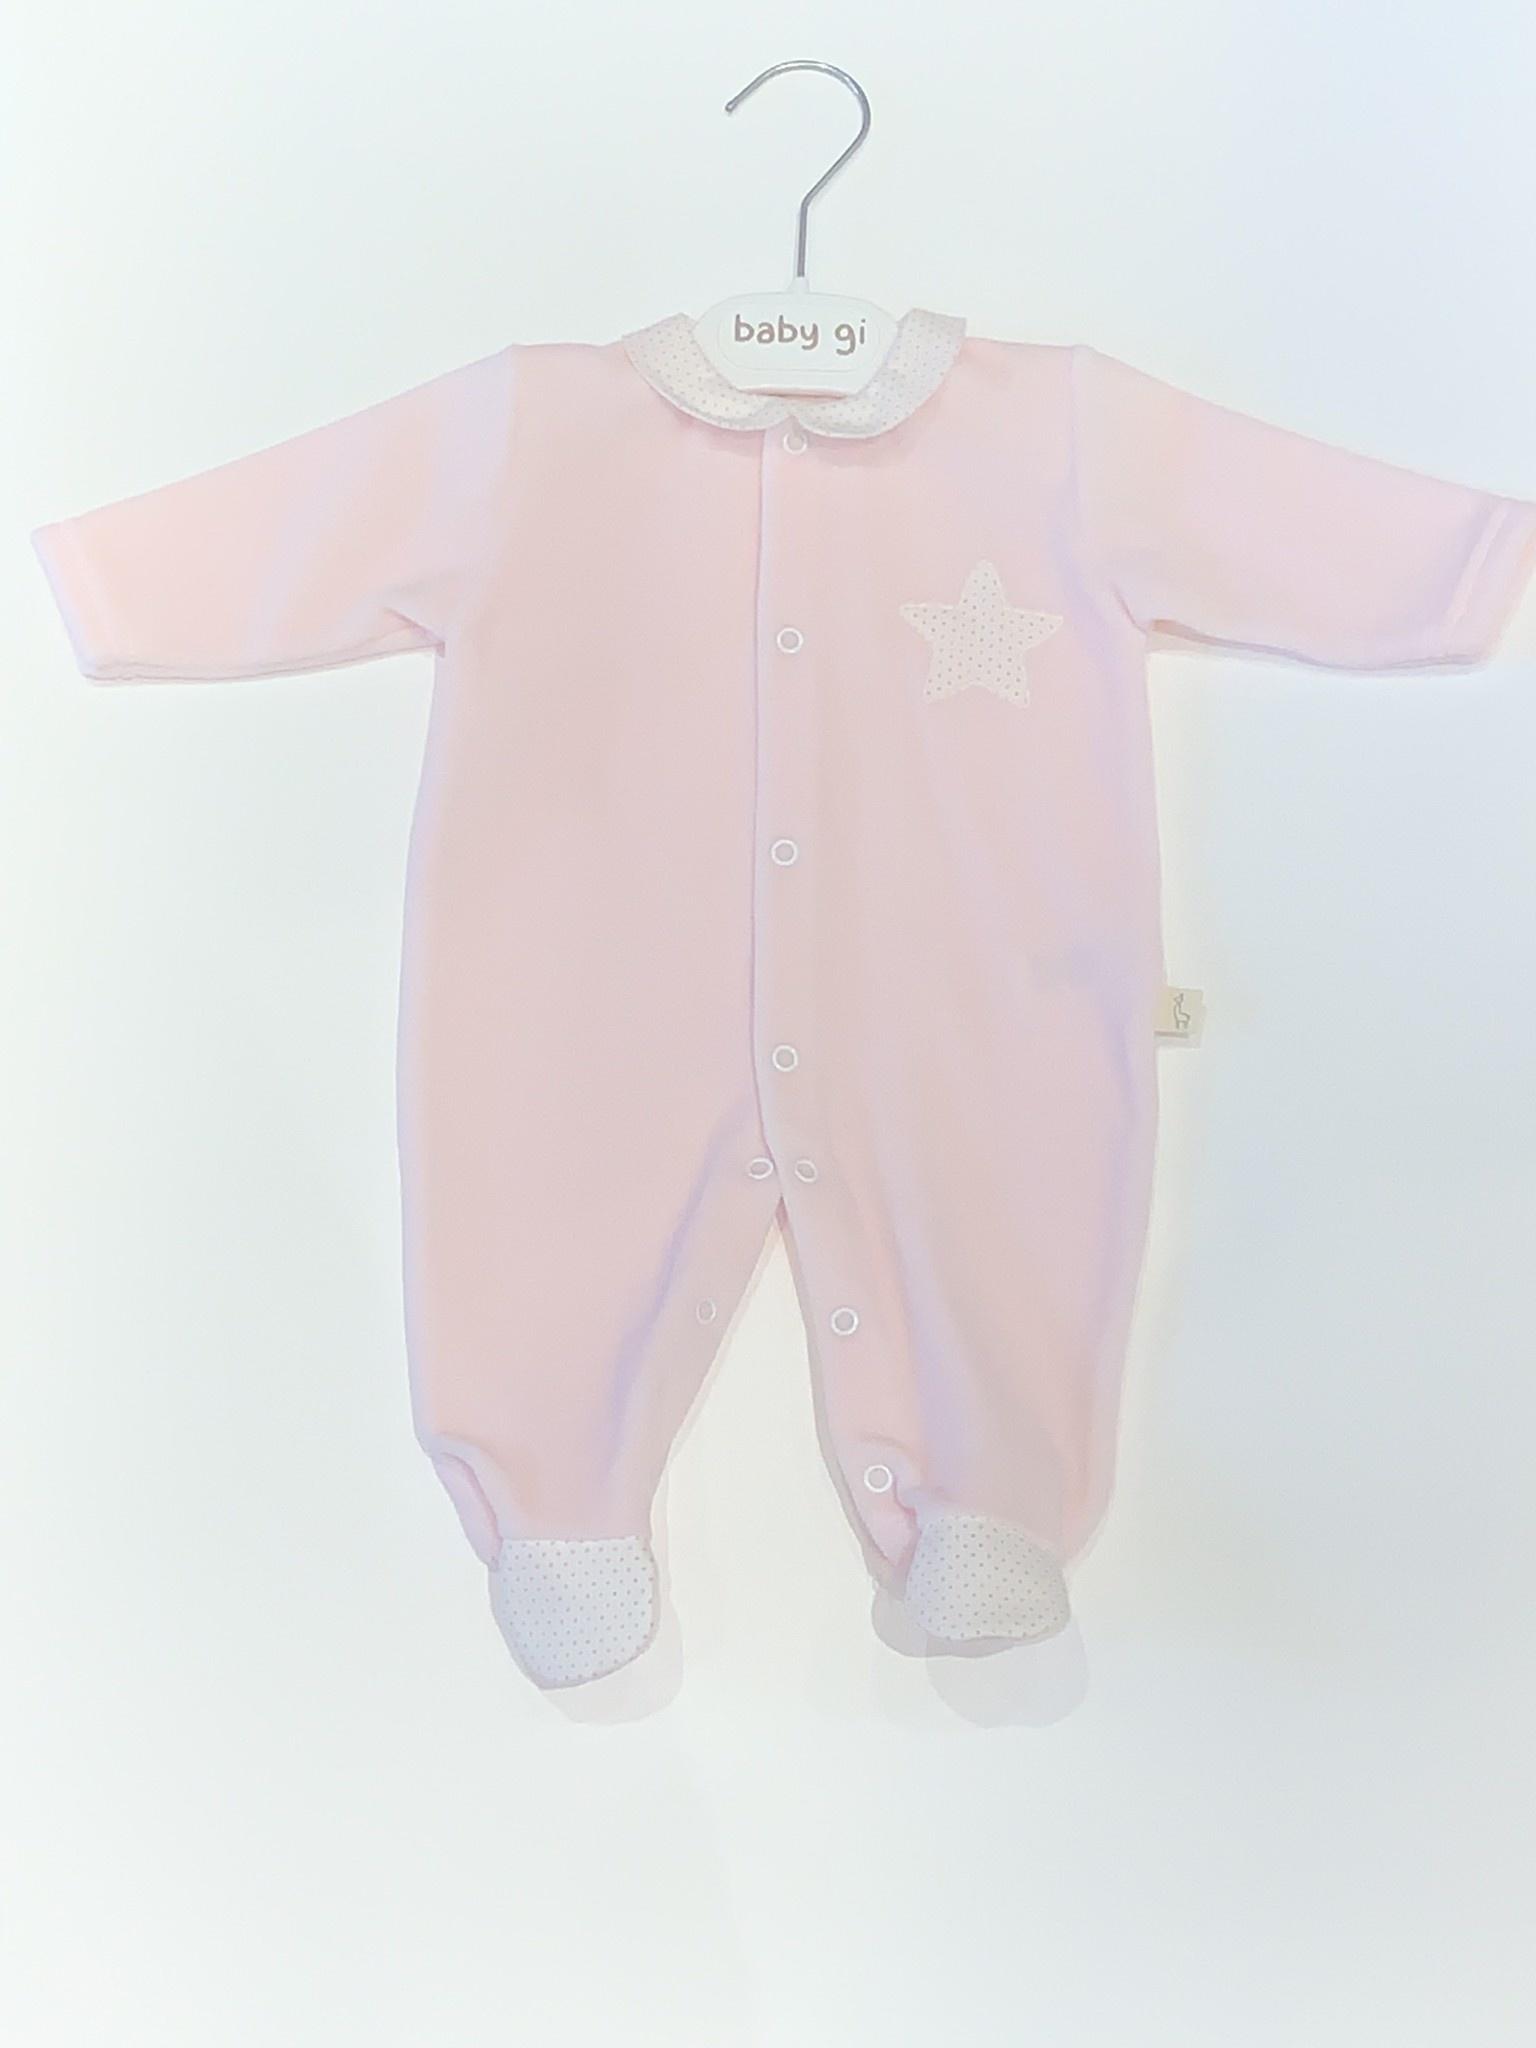 Baby Gi Baby gi pink velour star babygrow